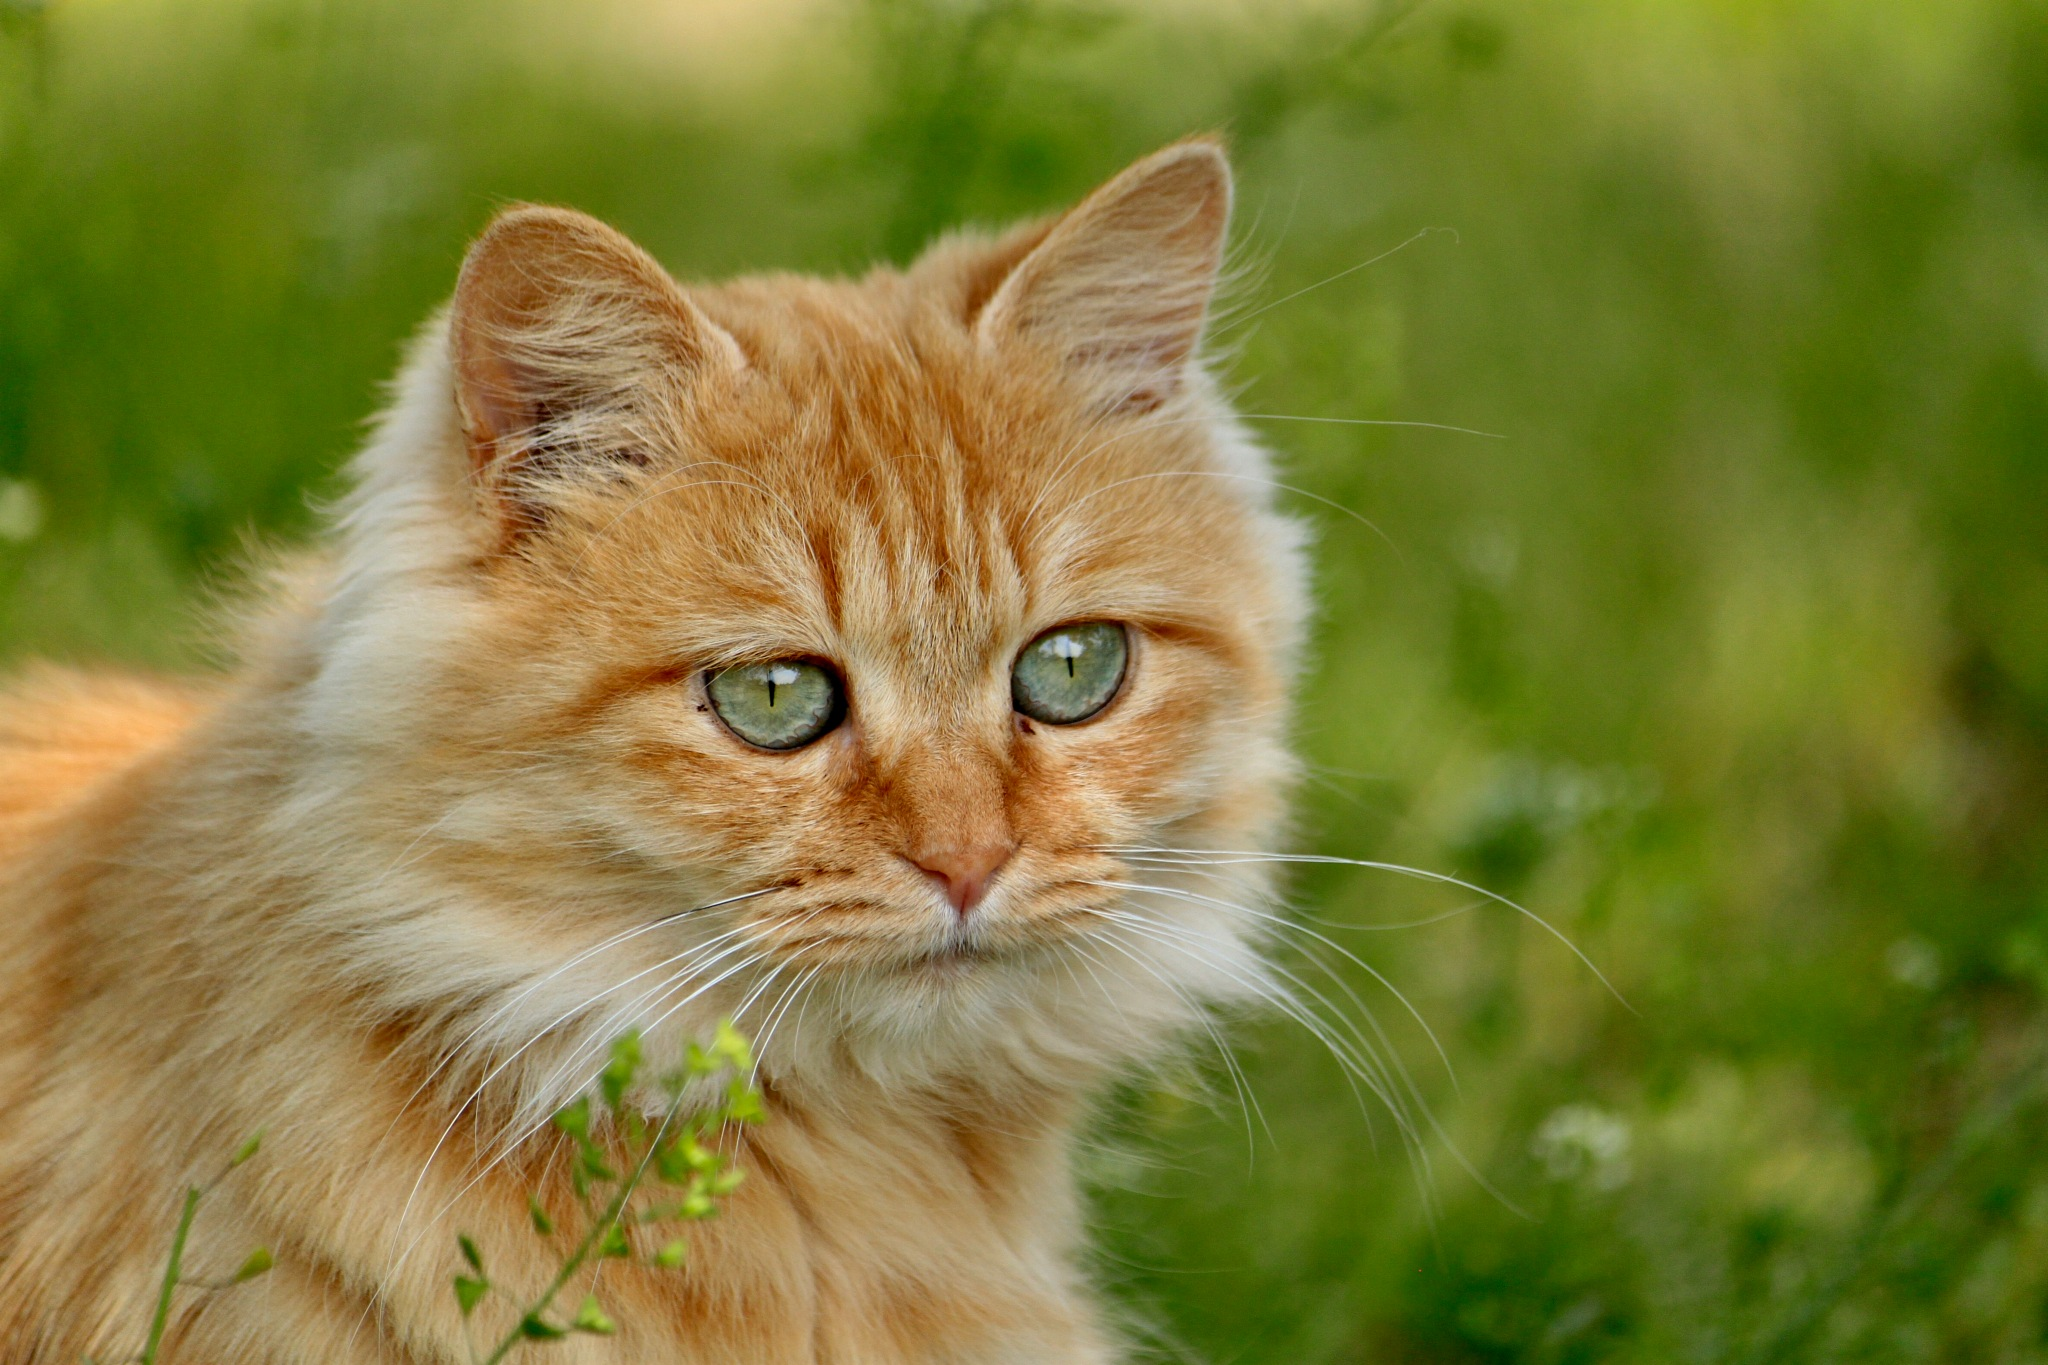 Red tabby cat  by Katsuko6